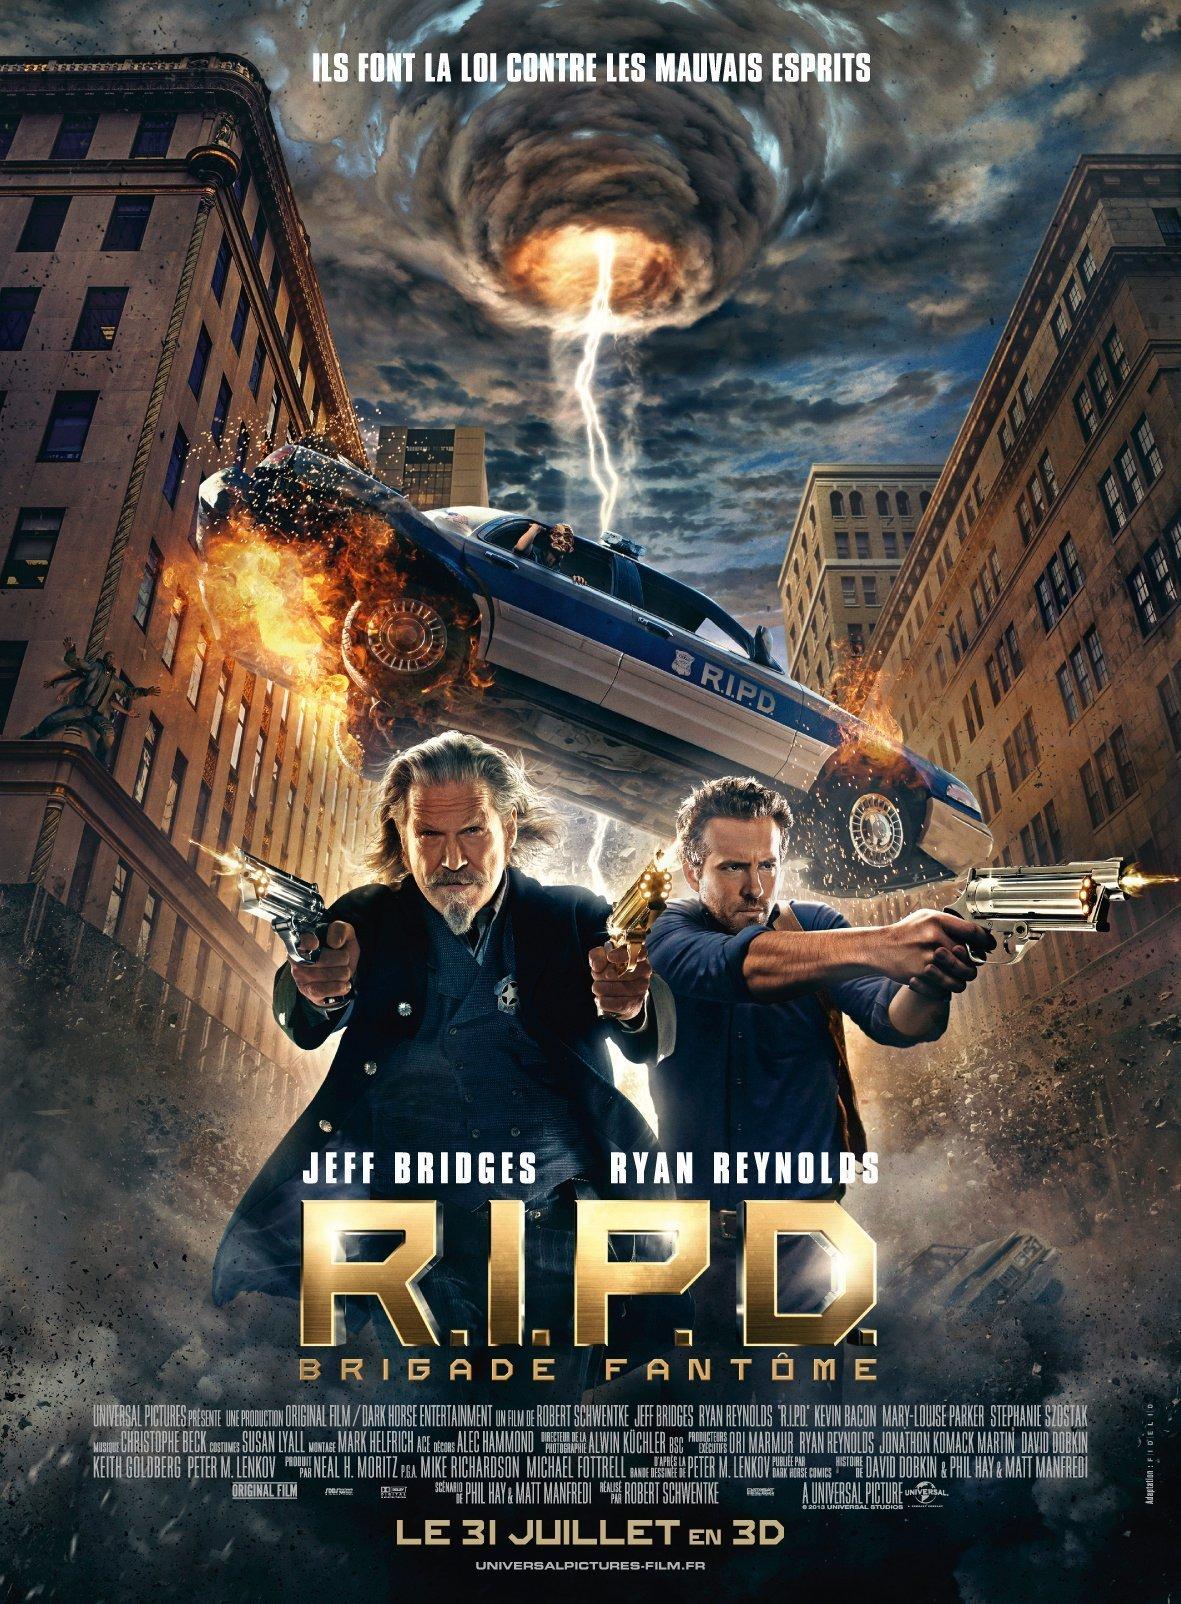 affiche du film R.I.P.D. Brigade fantôme